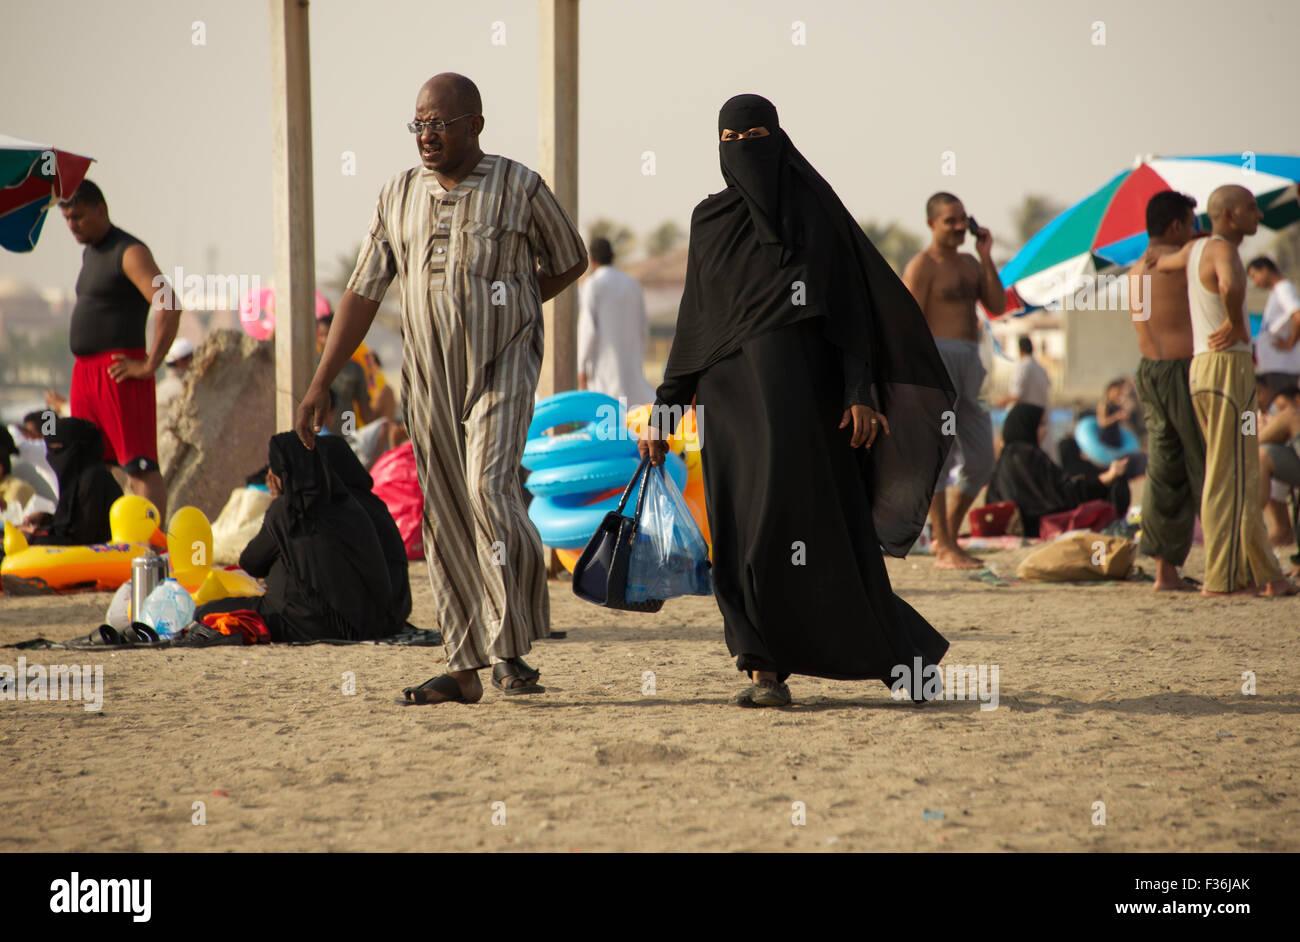 Muslim couple strolling on beach of the Red Sea in Jeddah, Saudi Arabia - Stock Image